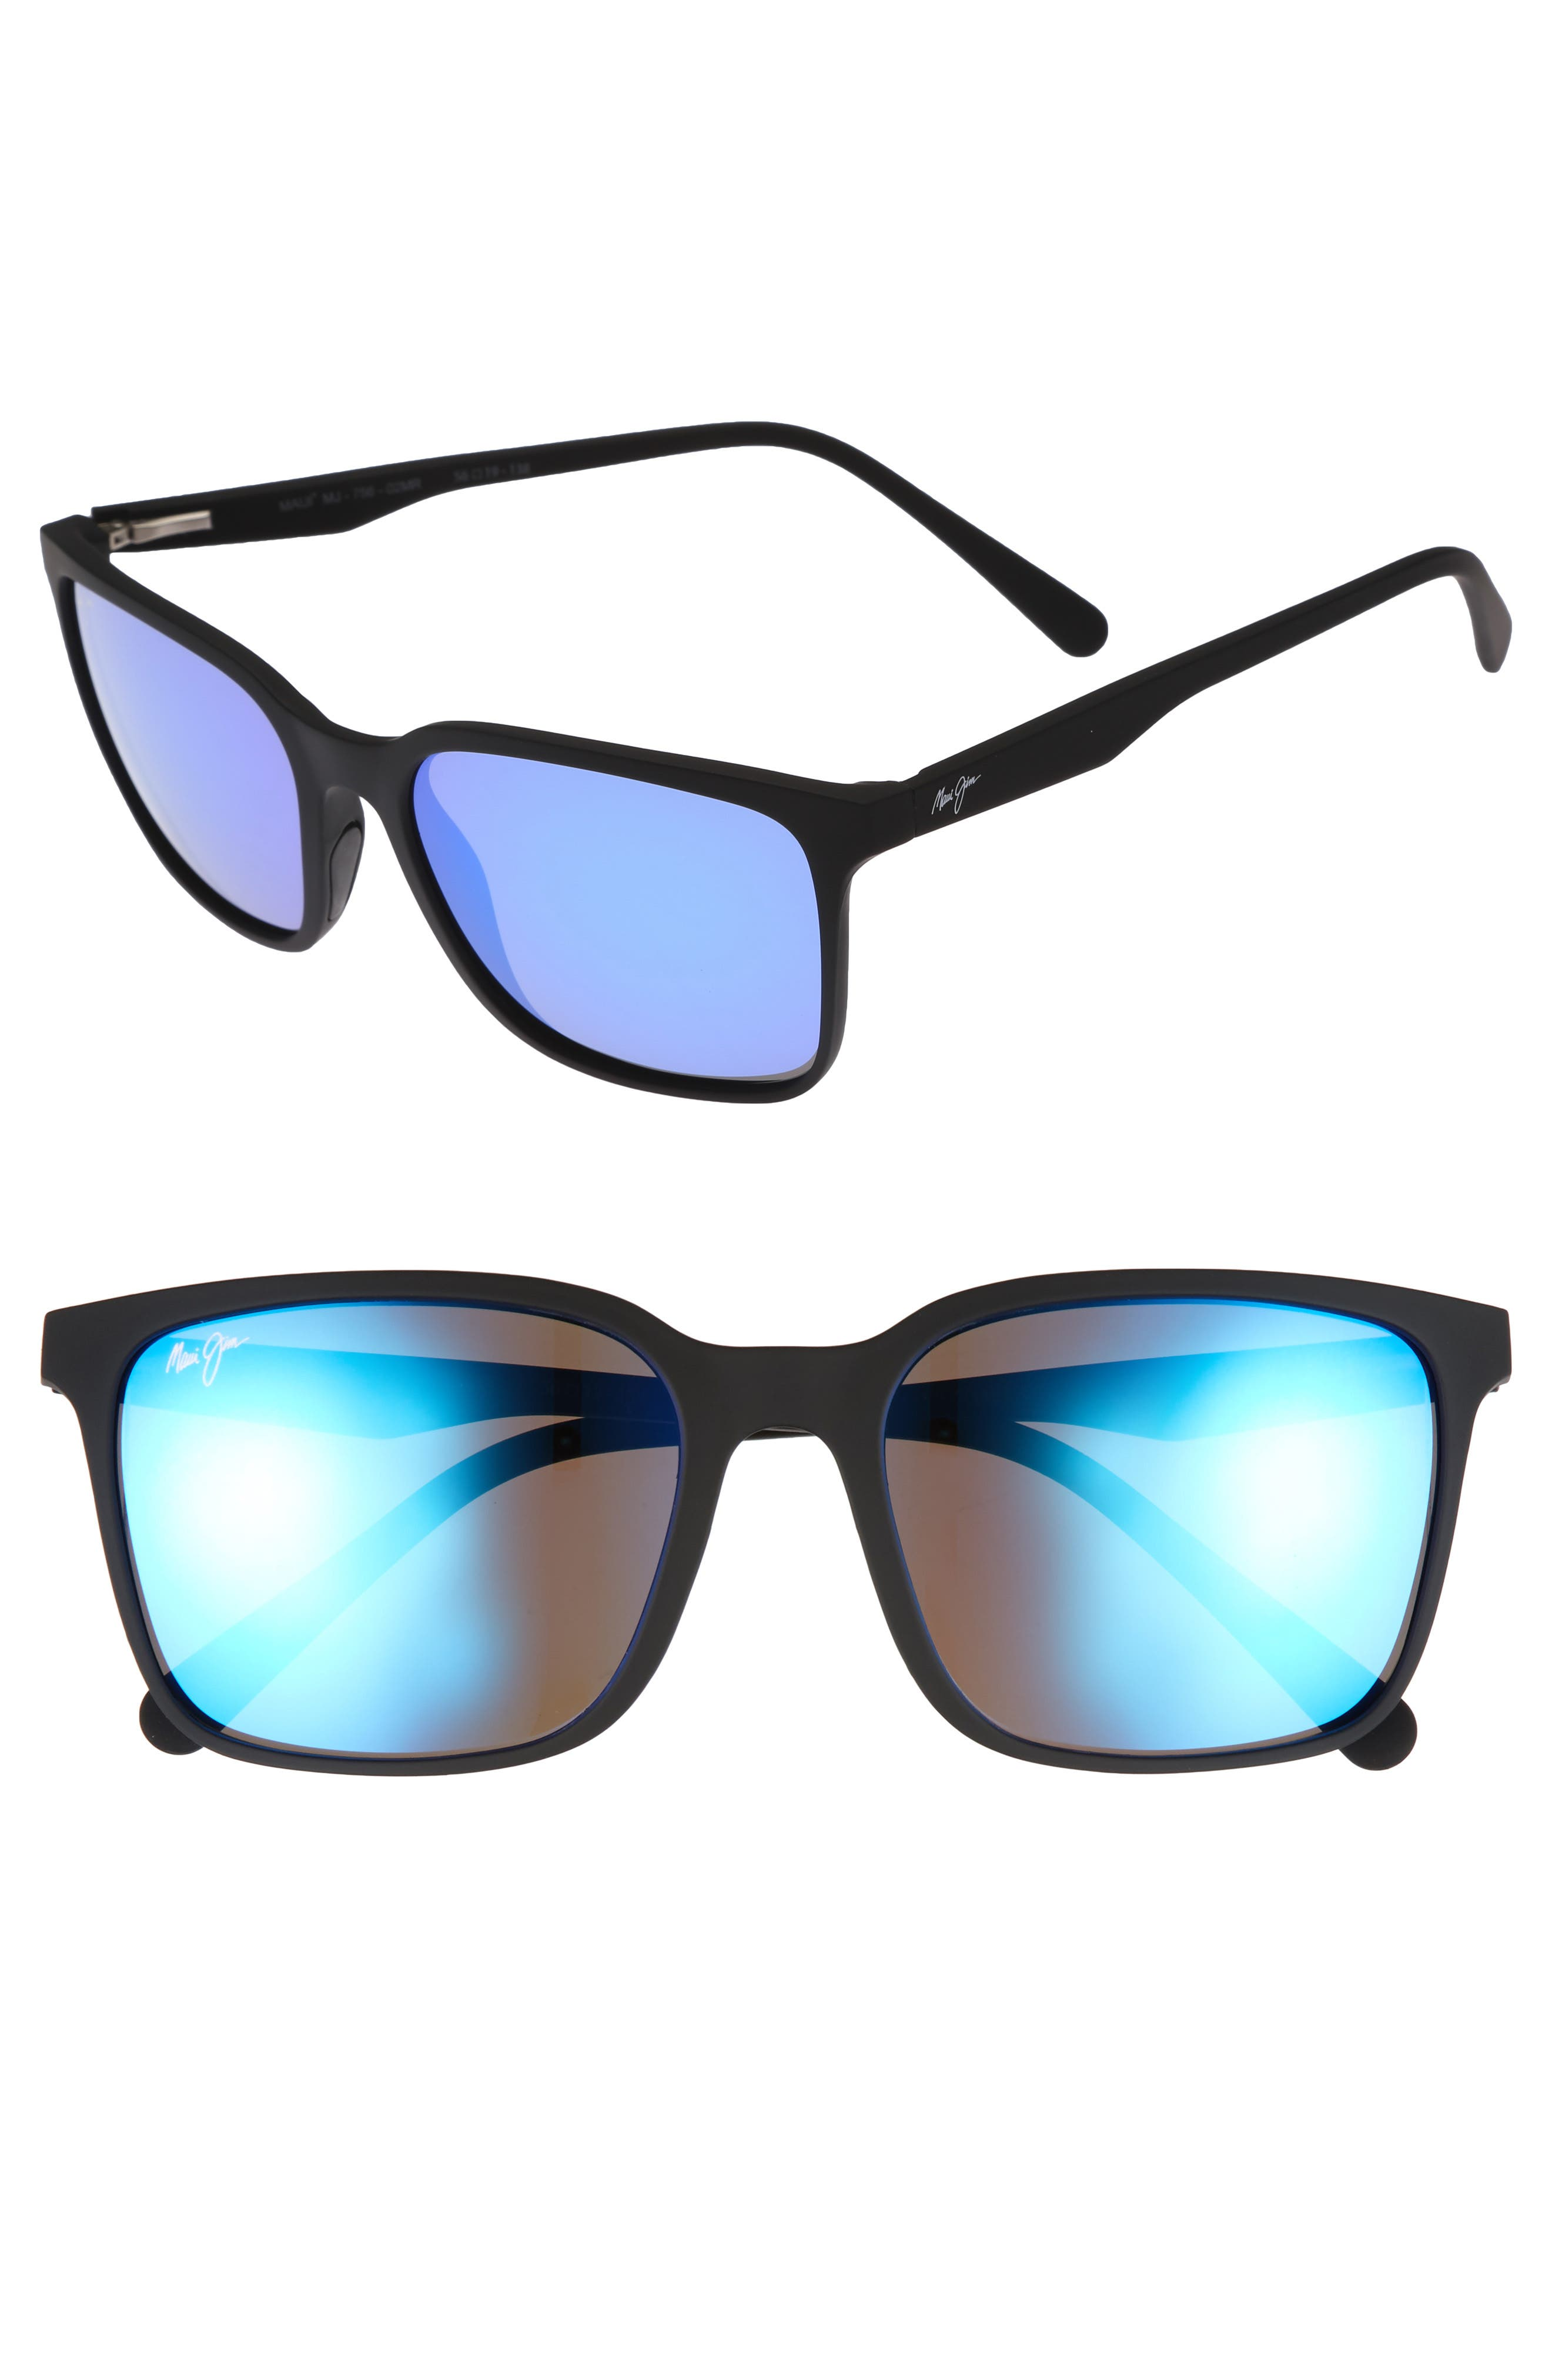 Wild Coast 56mm Polarized Sunglasses,                         Main,                         color, Matte Black/ Blue Hawaii